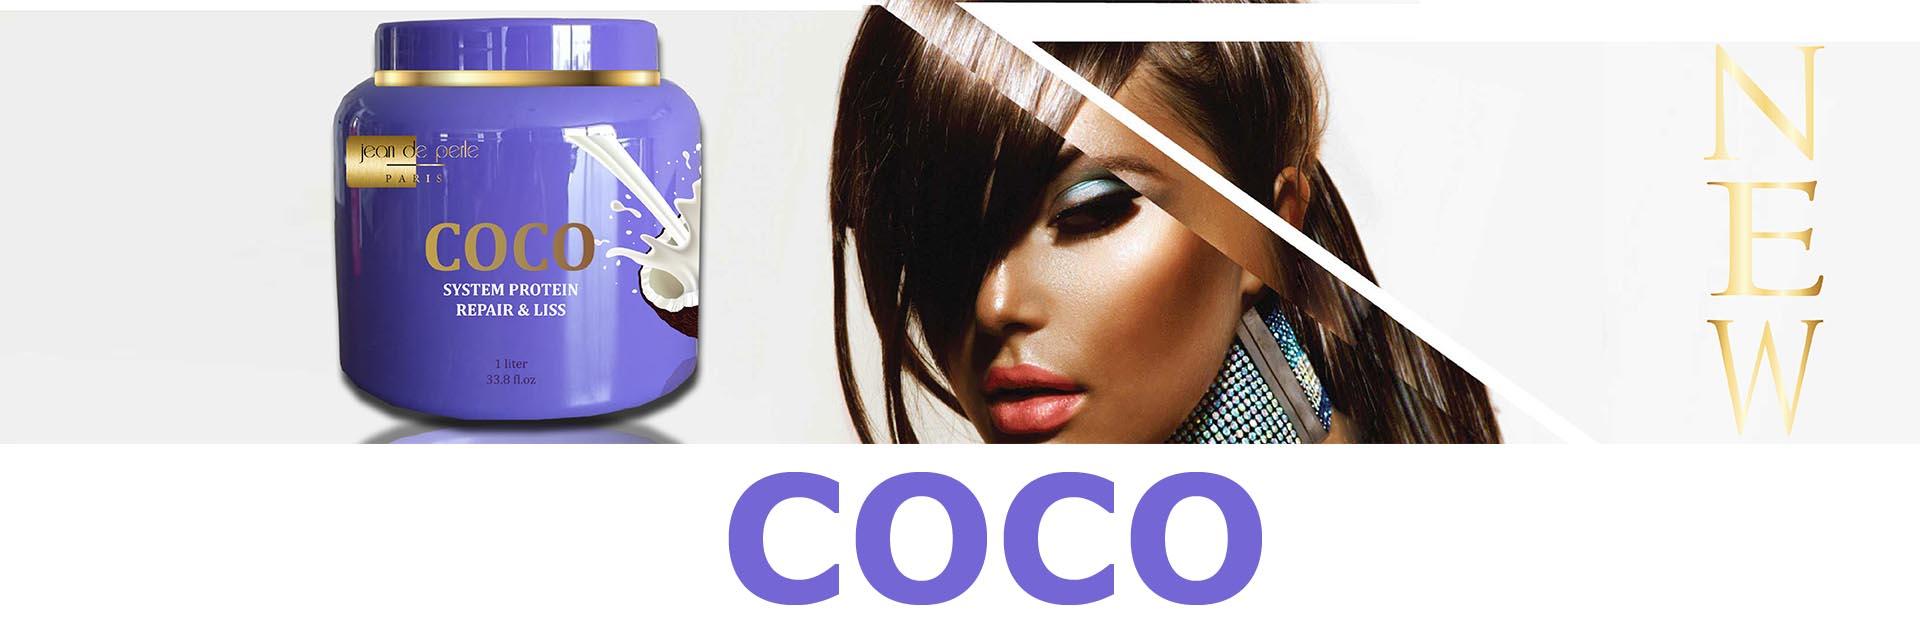 COCO - Step by Step